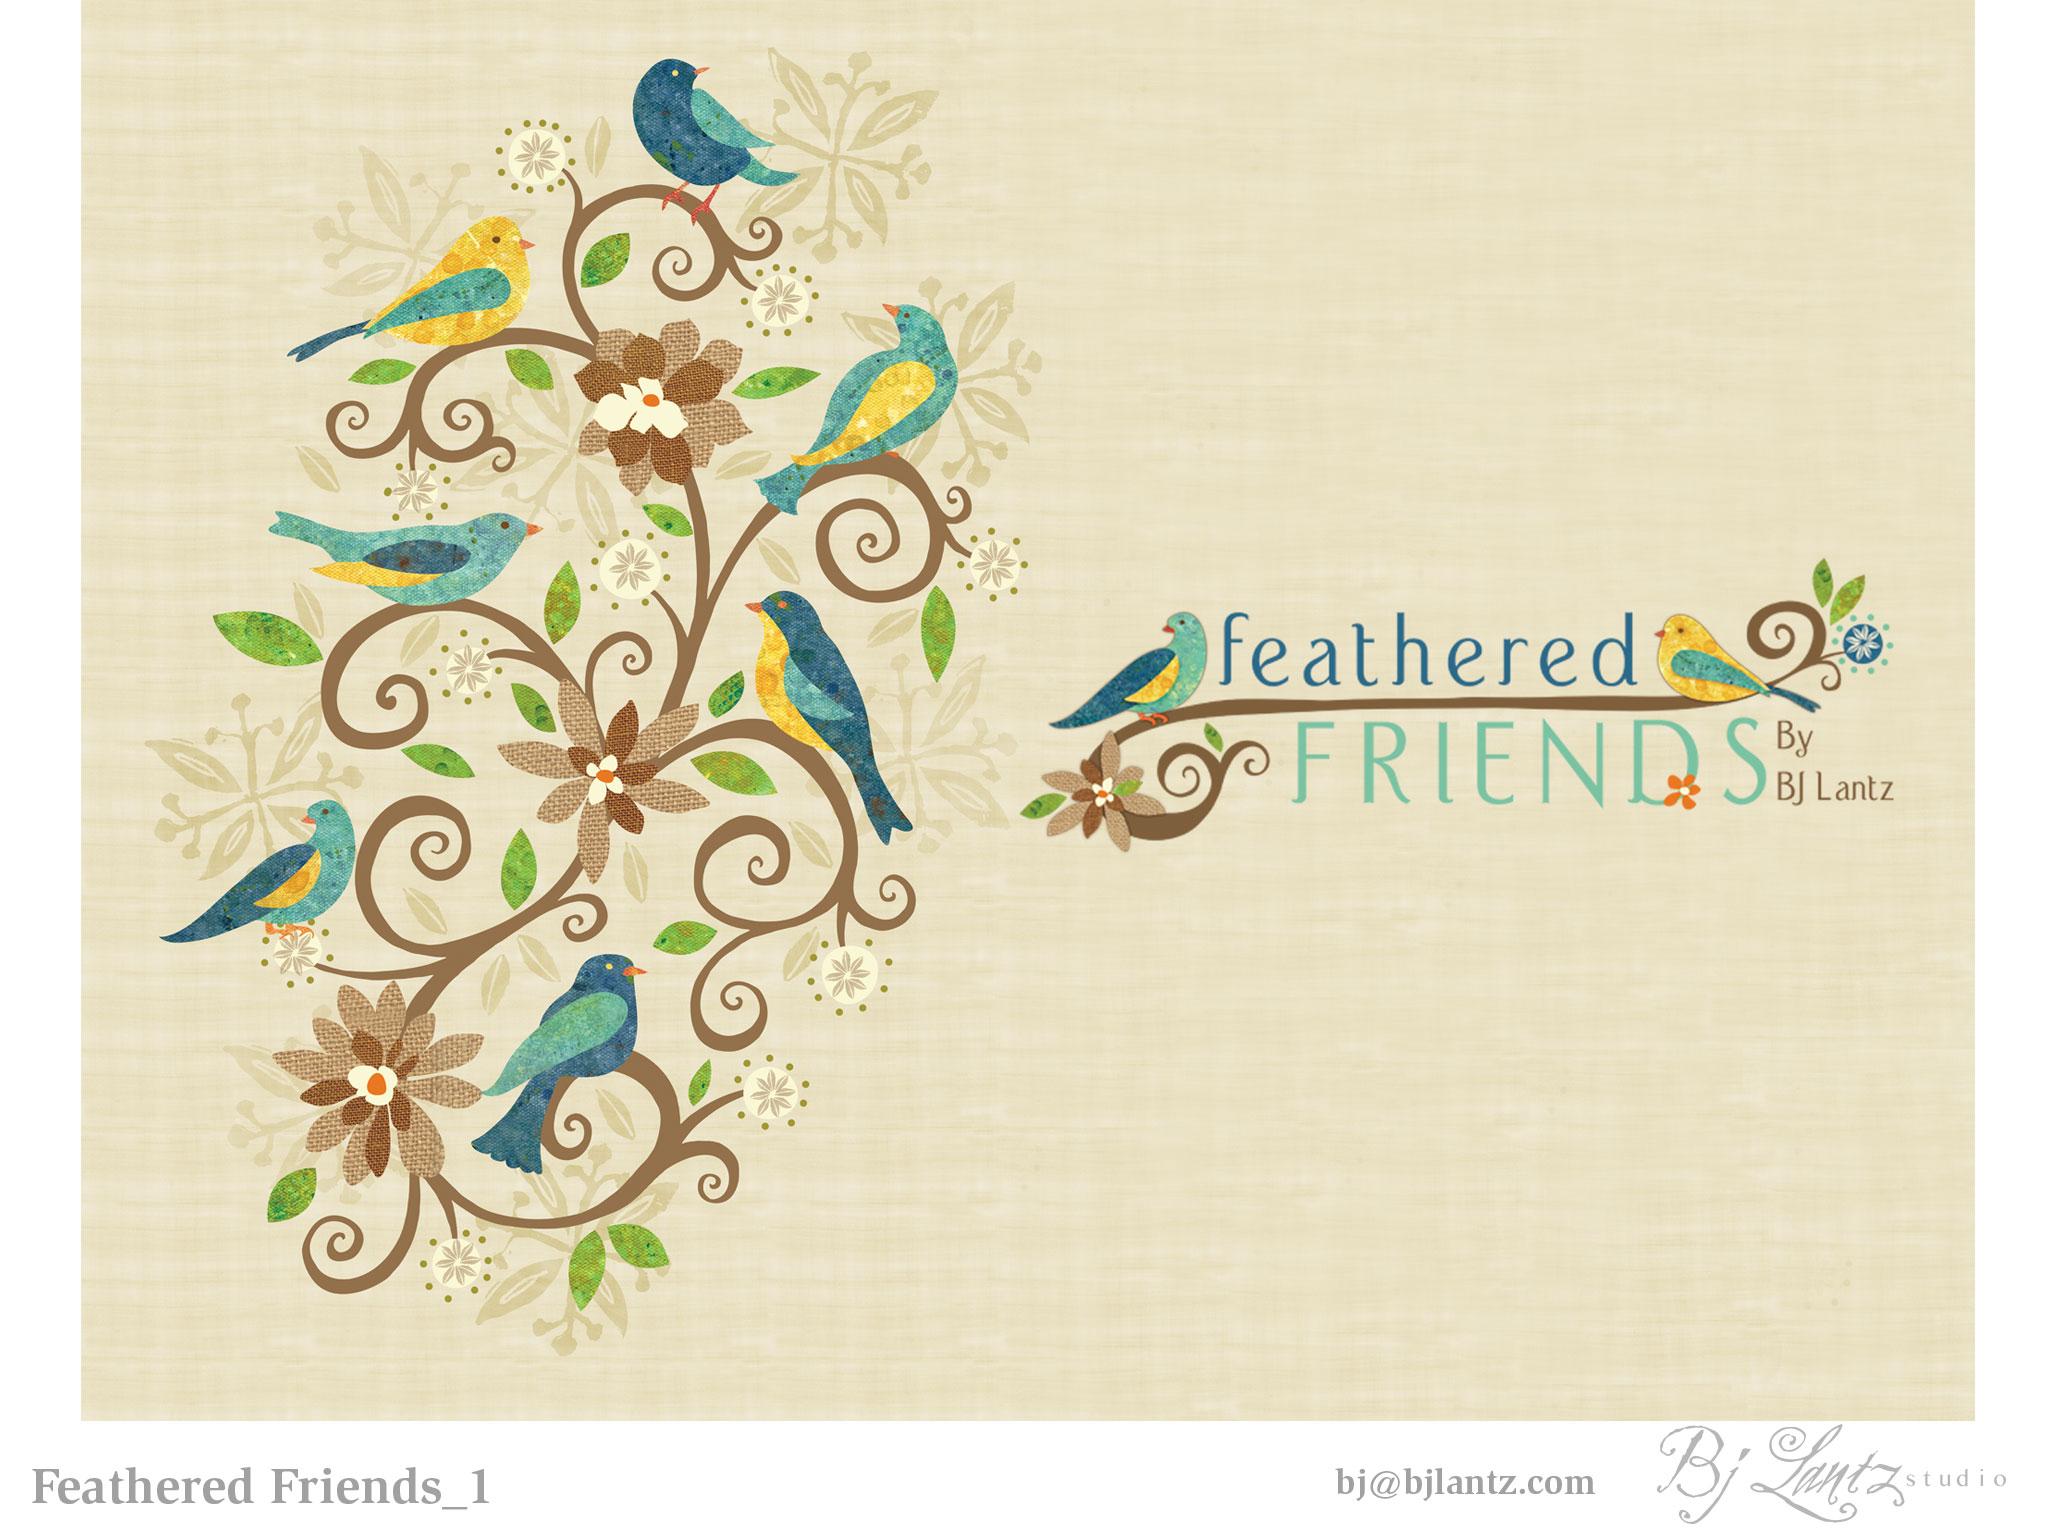 FeatheredFriends_1_BJLantz_portfolio.jpg